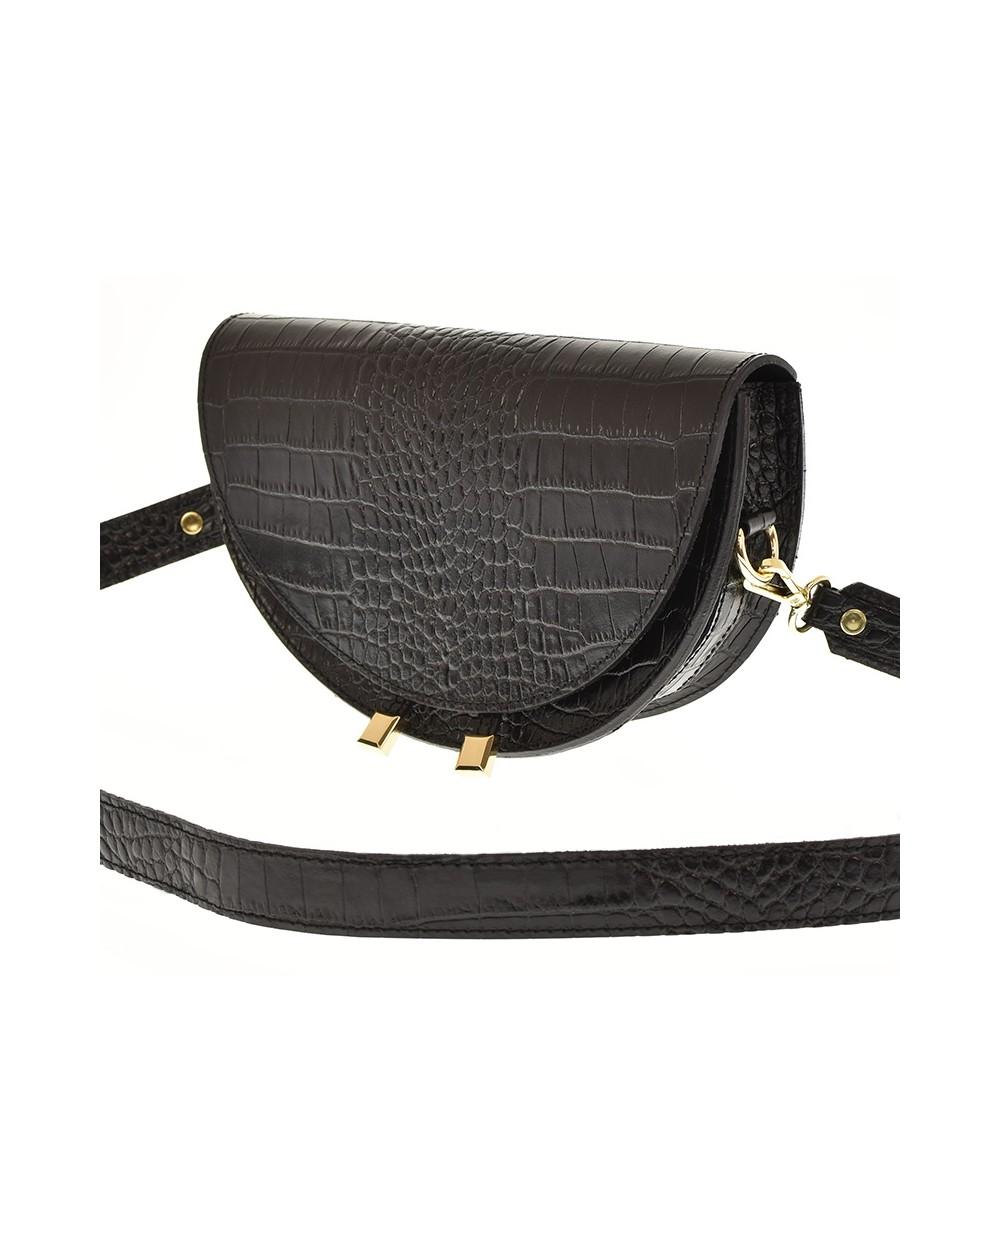 Półokrągła designerska torebka skórzana krokodyl czarna | Torebki damskie skórzane